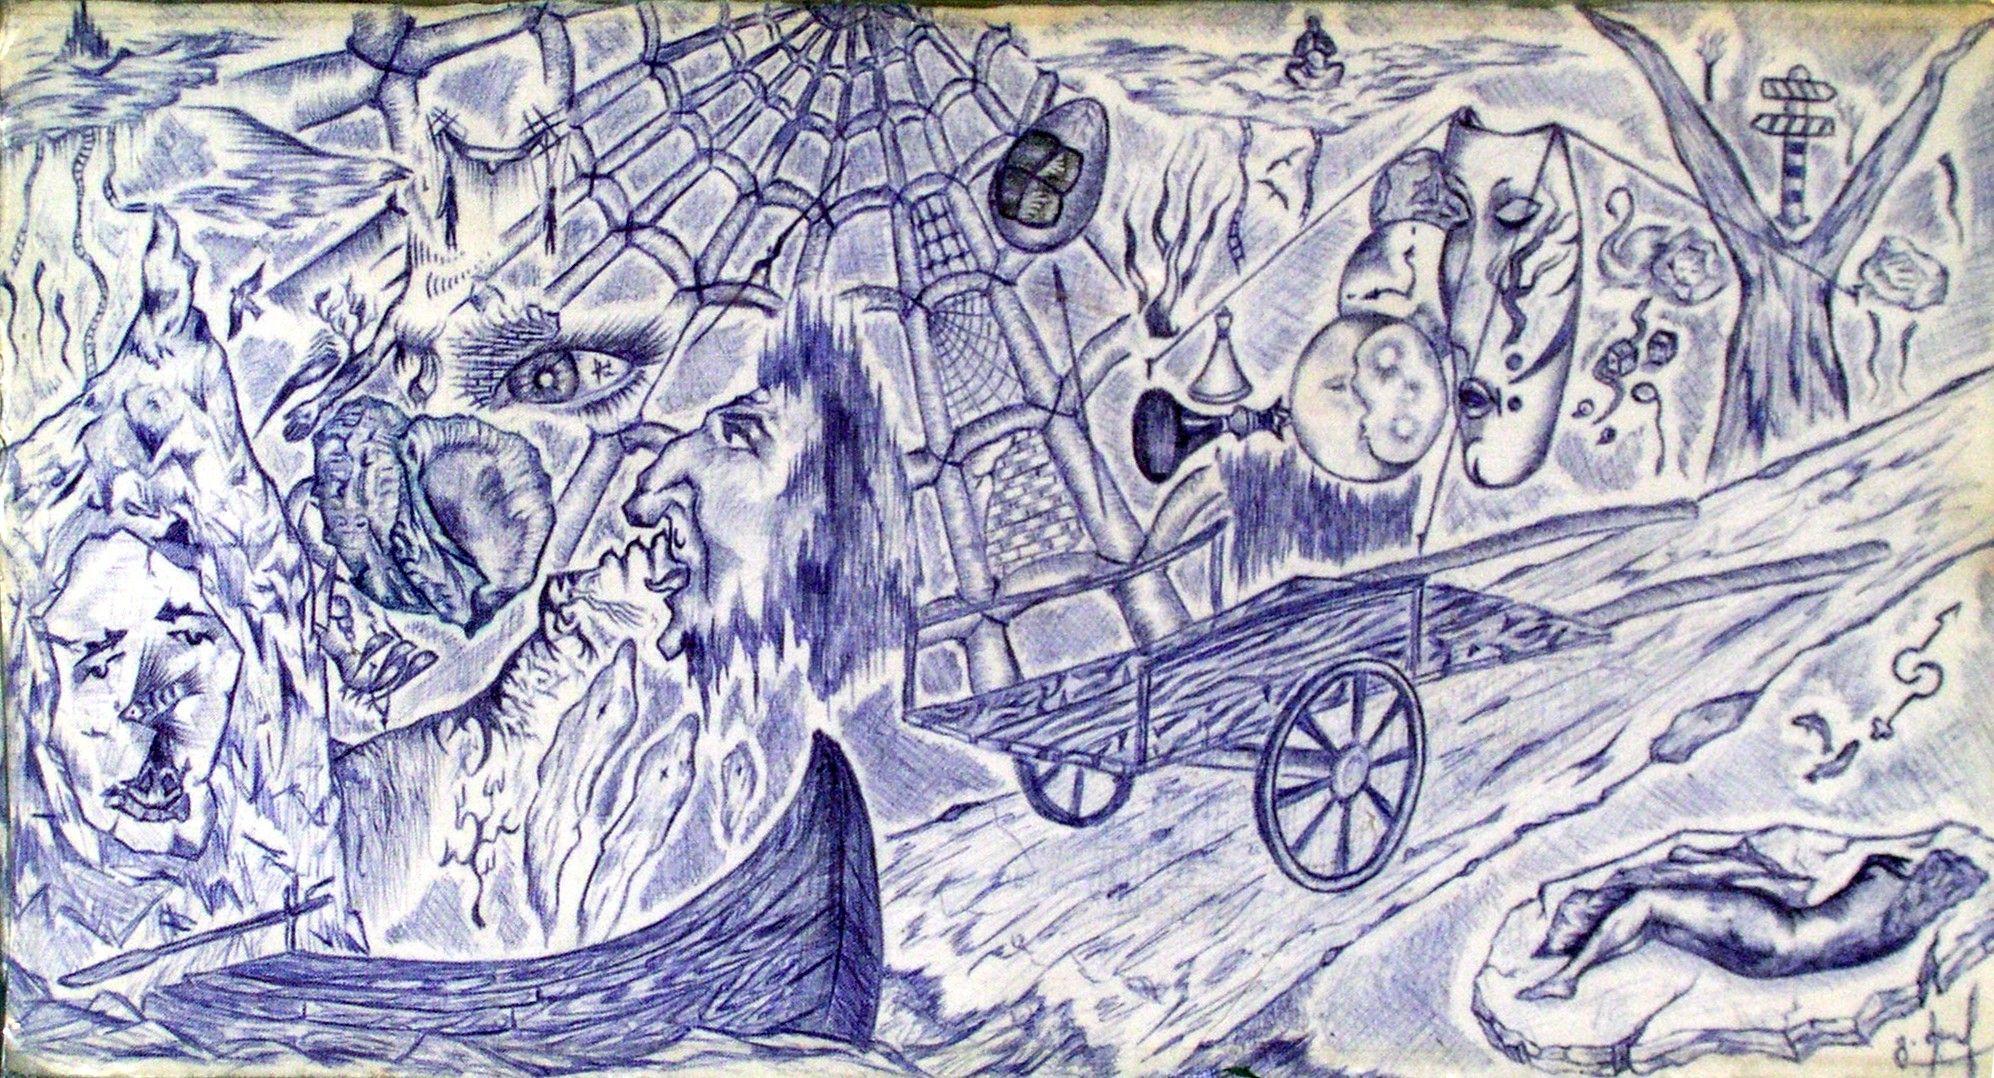 Art Galleri Gocha Medzmariashvili (Mego) შესრულებულია ტილოზე პასტით.(მიტკალი, ბიაზი)Performed on the canvas with a ballpoint pen.